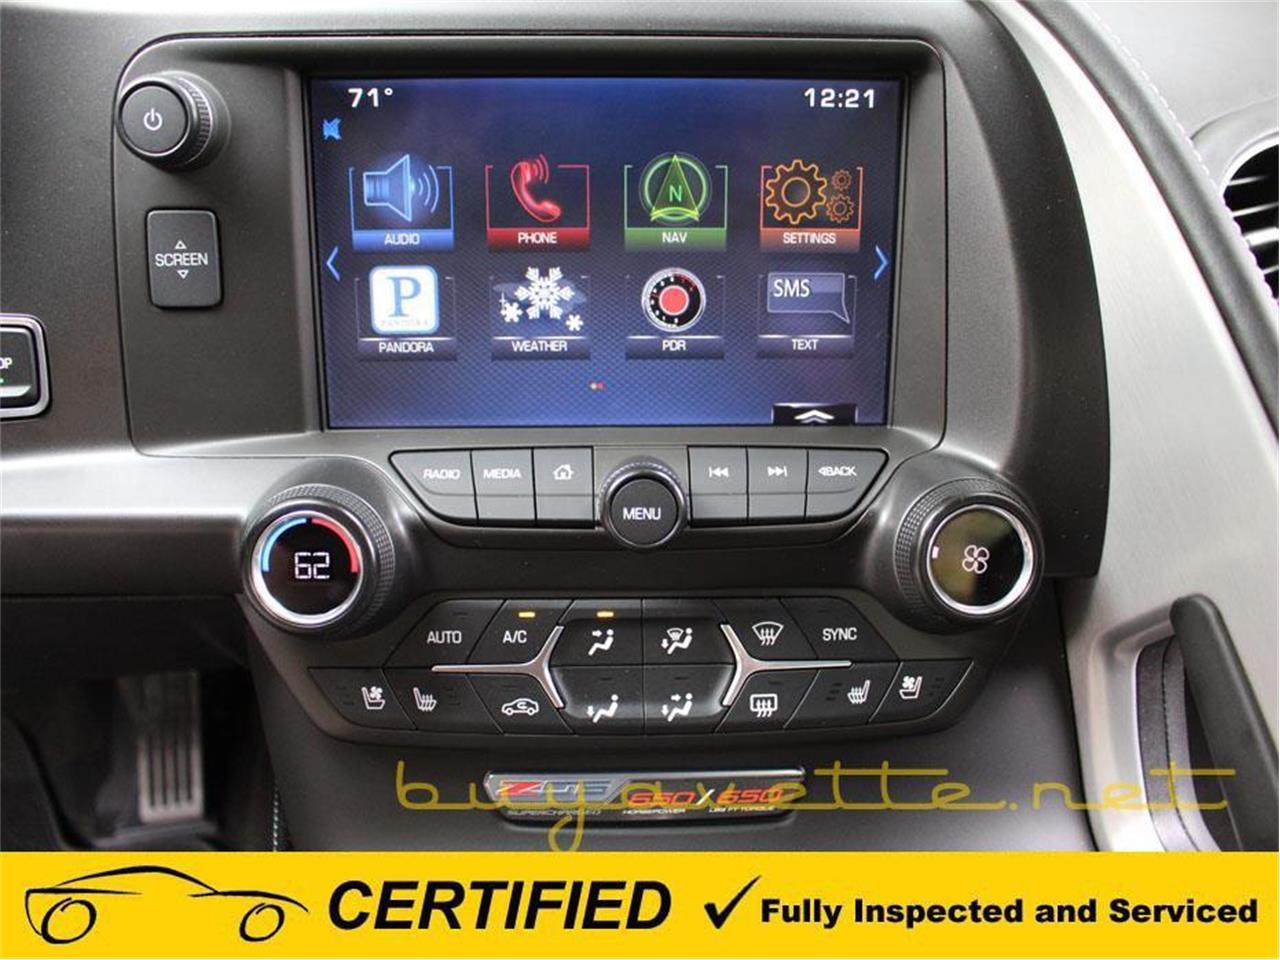 2015 Chevrolet Corvette (CC-1410610) for sale in Atlanta, Georgia